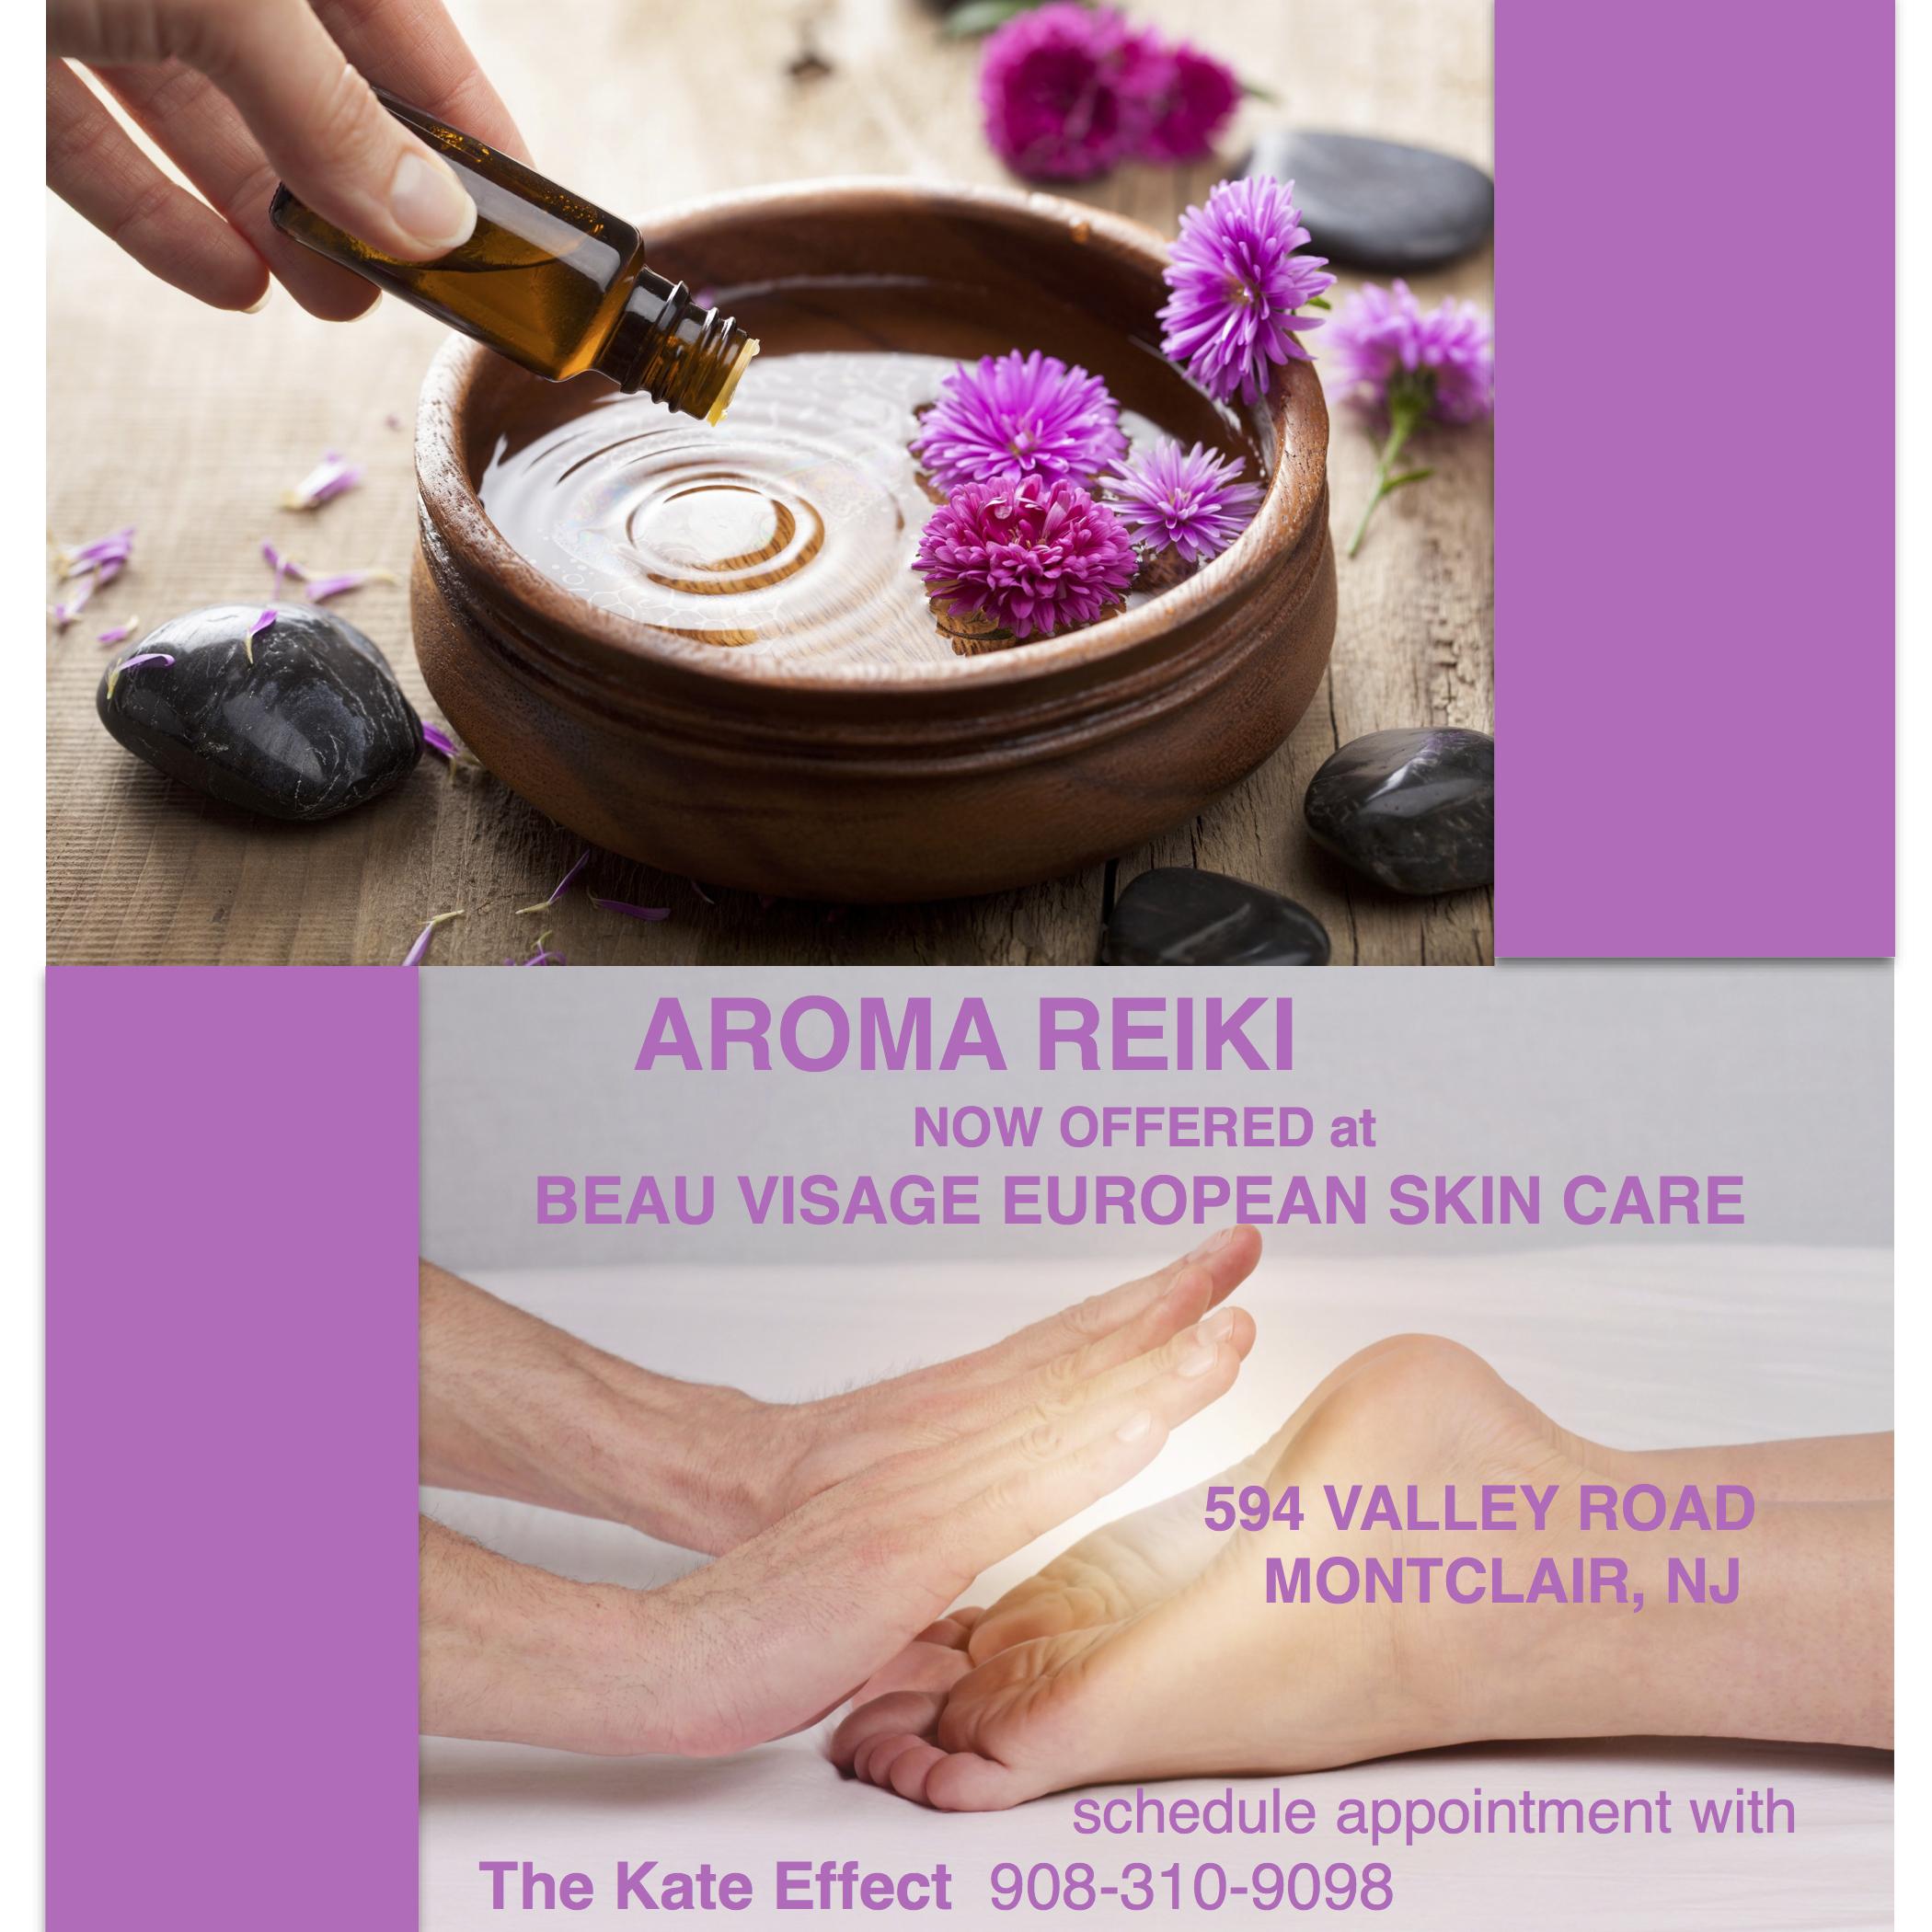 Aroma Reiki at Beau Visage Flyer.jpg